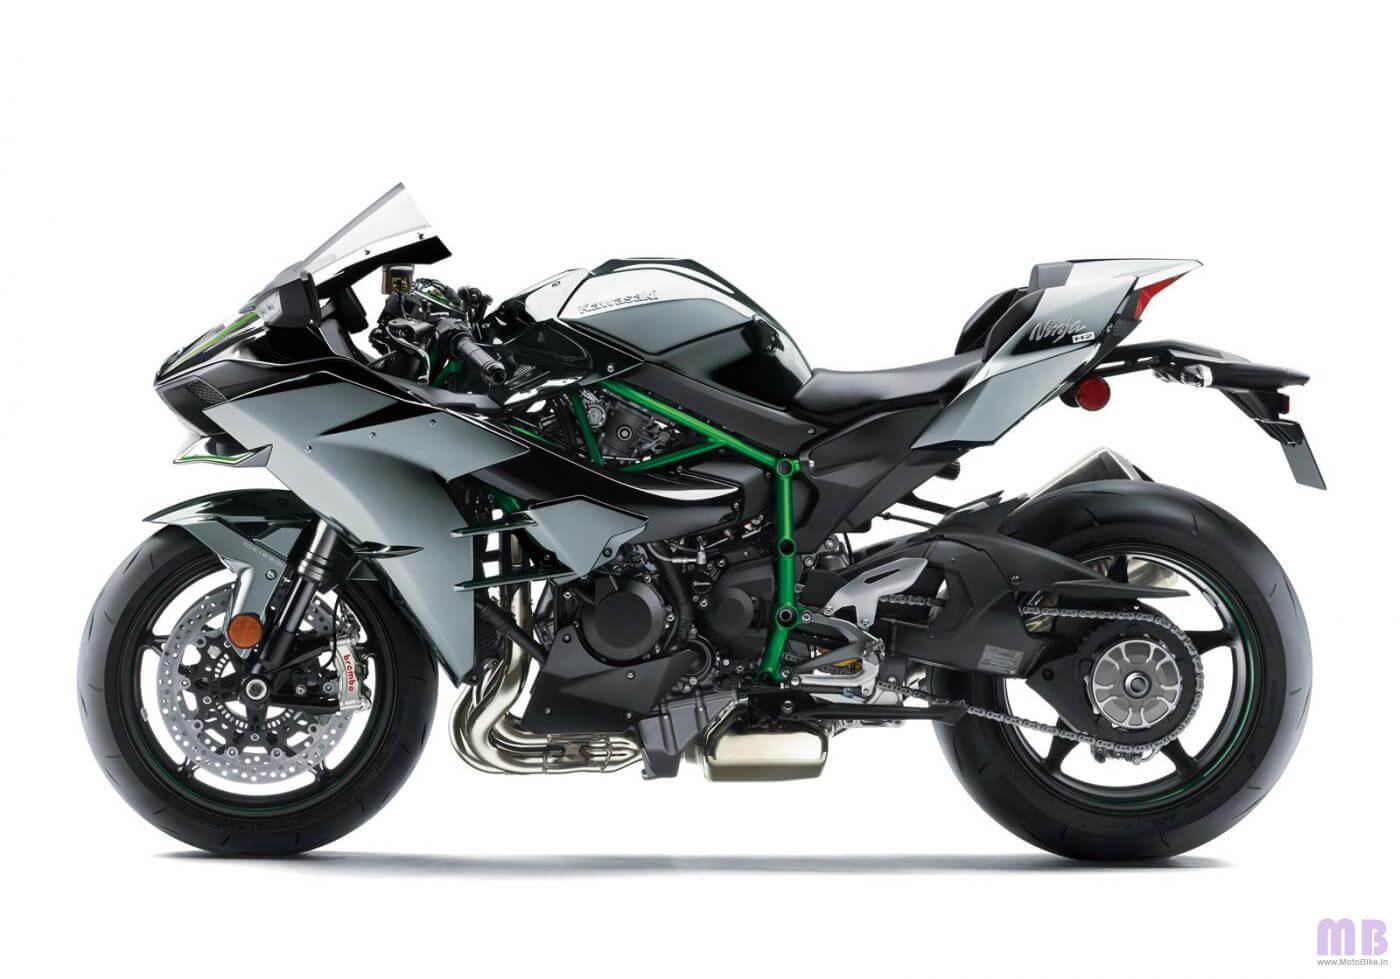 Kawasaki Ninja H2 Side View